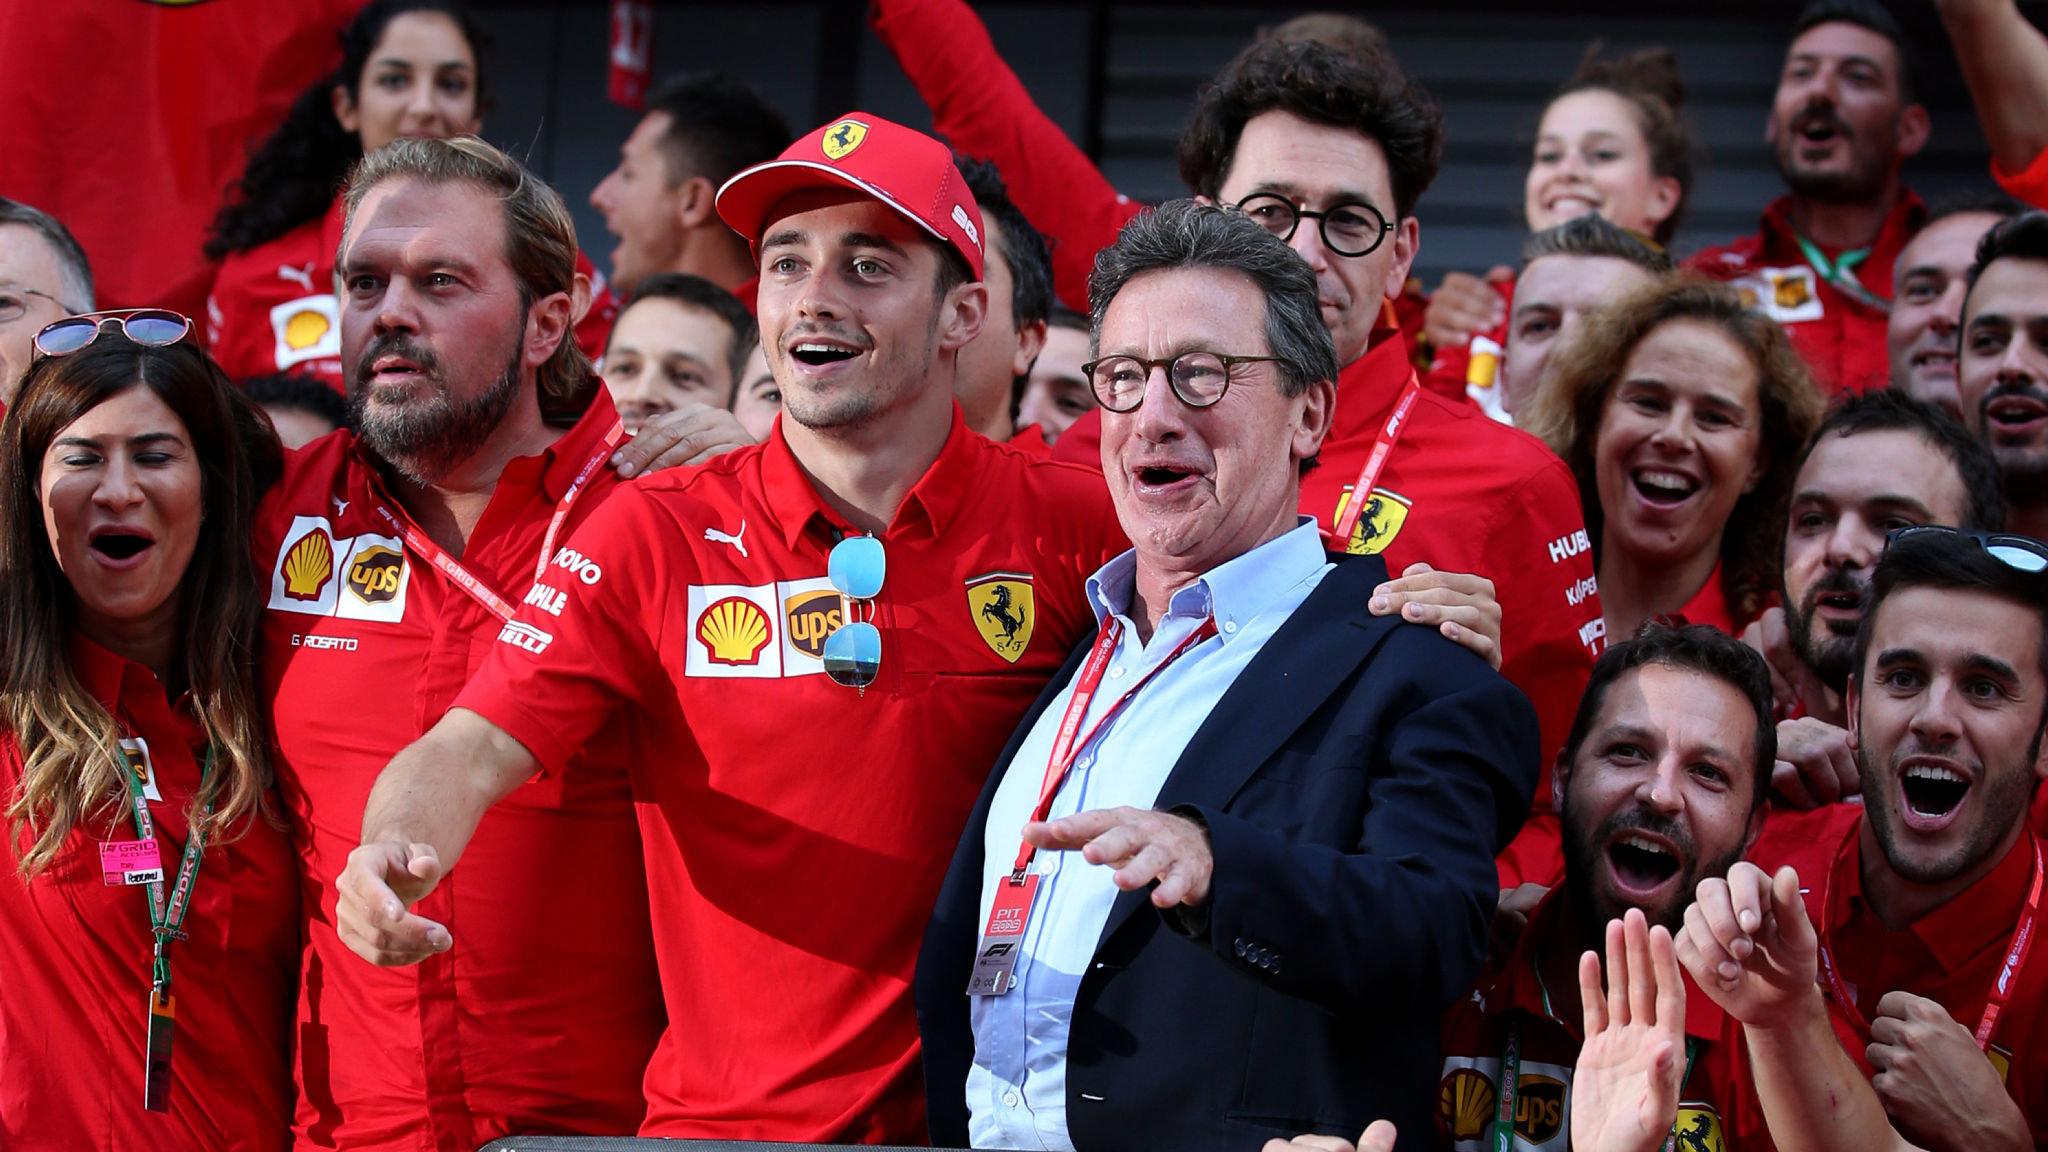 Camilleri has 'serene' plans to revive Ferrari's Formula One fortunes